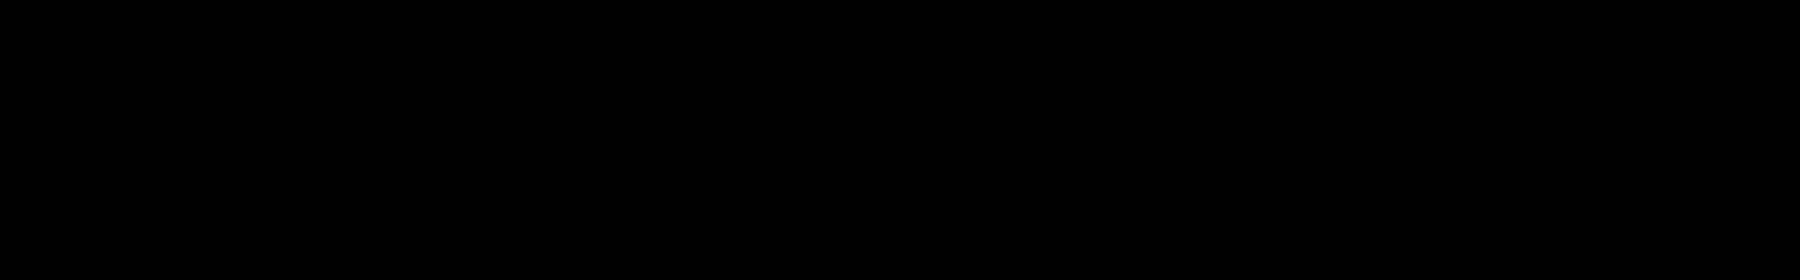 'Lo-Phi' for Phosphor 3 audio waveform